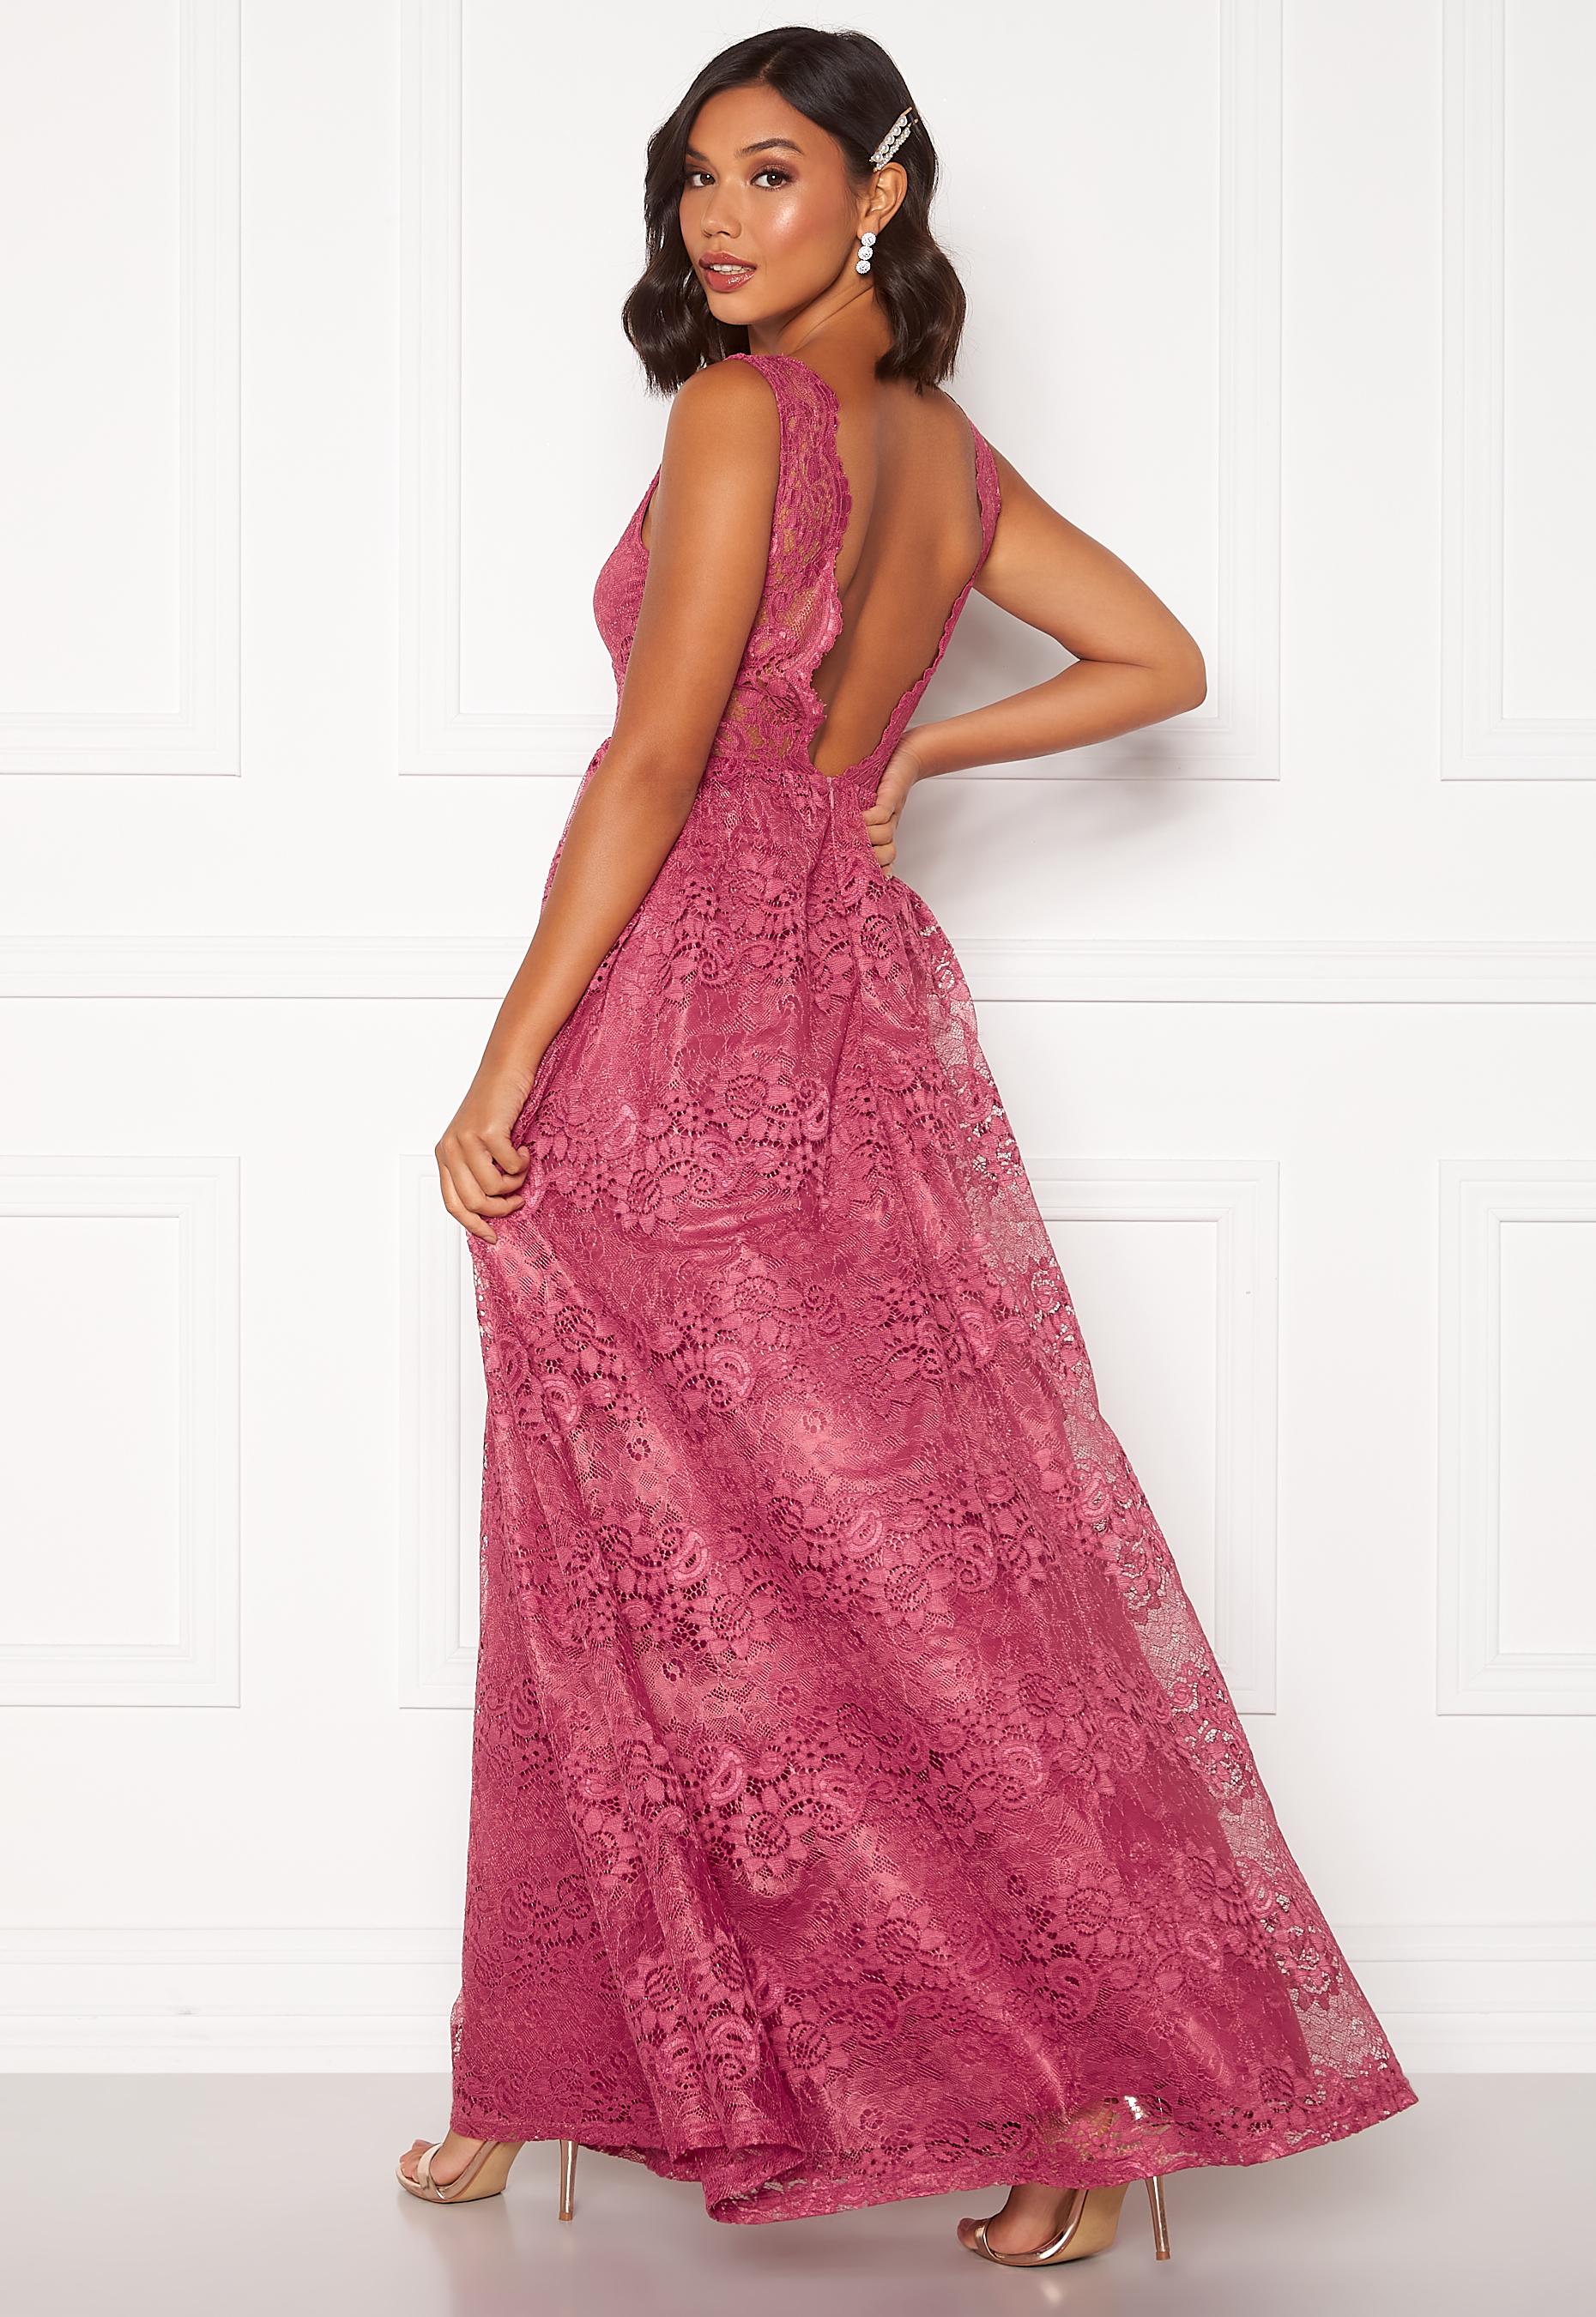 Lace dress Louize   raspberry red